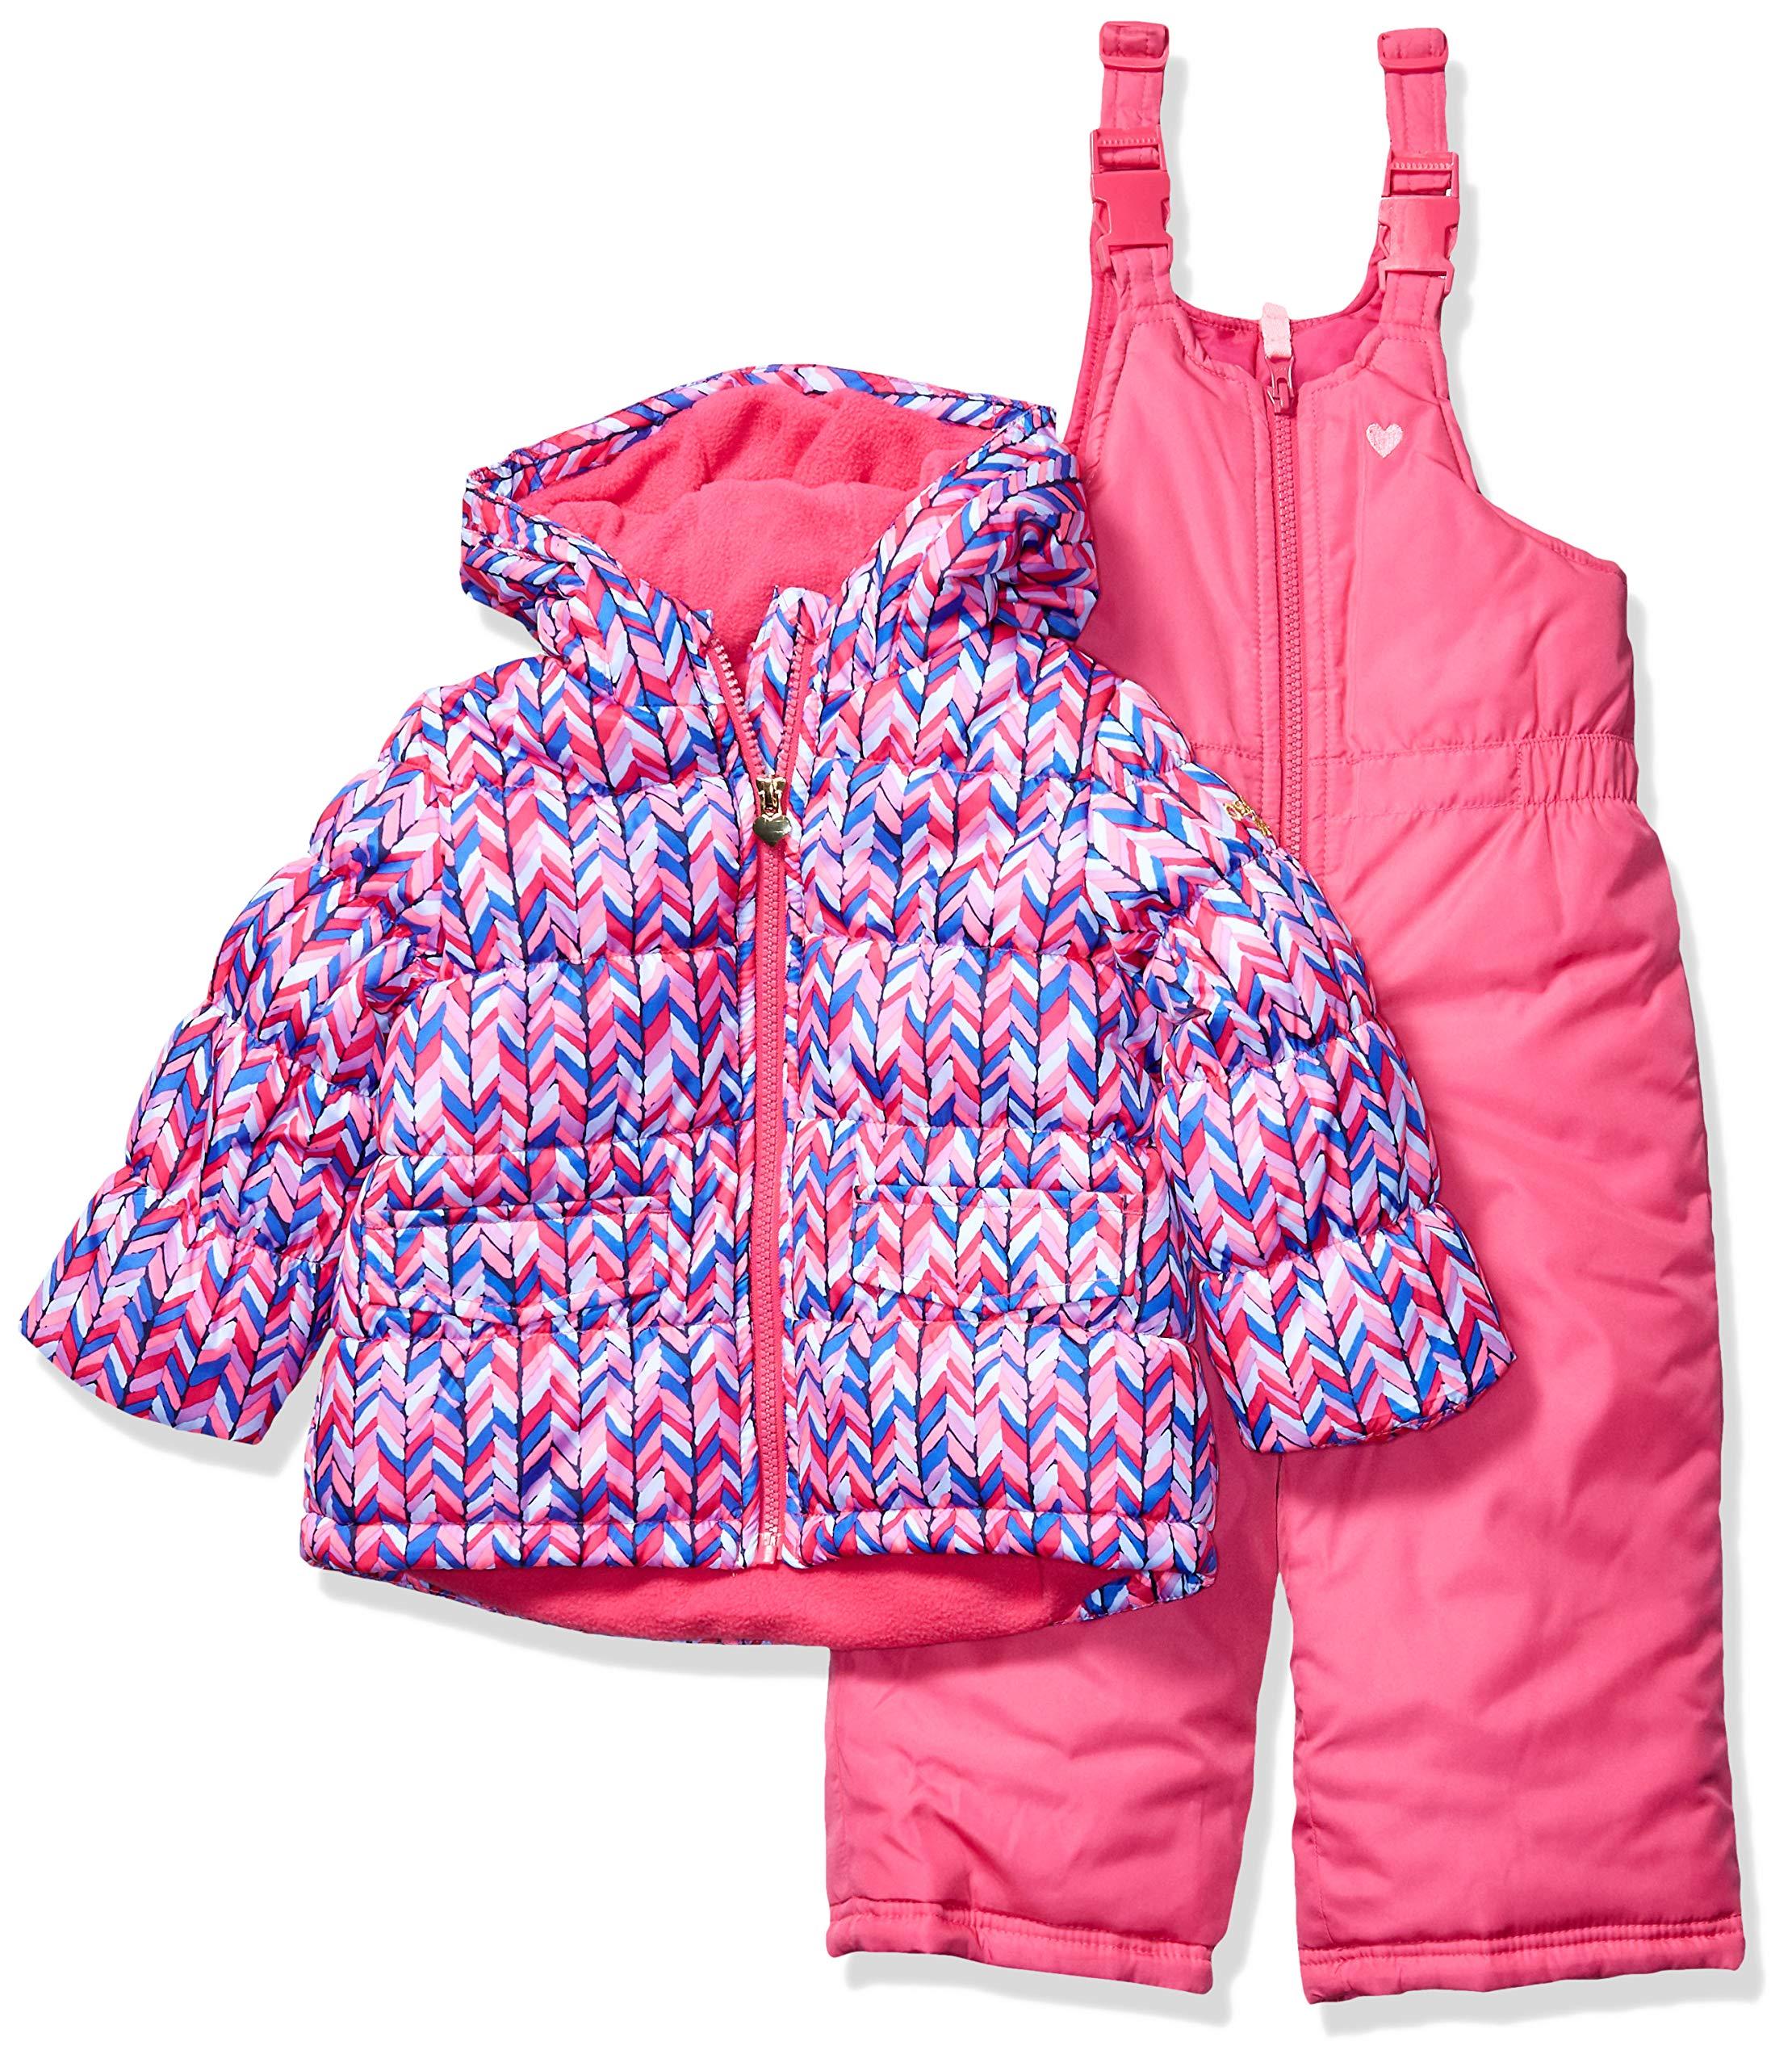 Osh Kosh Girls' Little Ski Jacket and Snowbib Snowsuit Outfit Set, Magenta Chevron Pink and Bright Pink, 5/6 by OshKosh B'Gosh